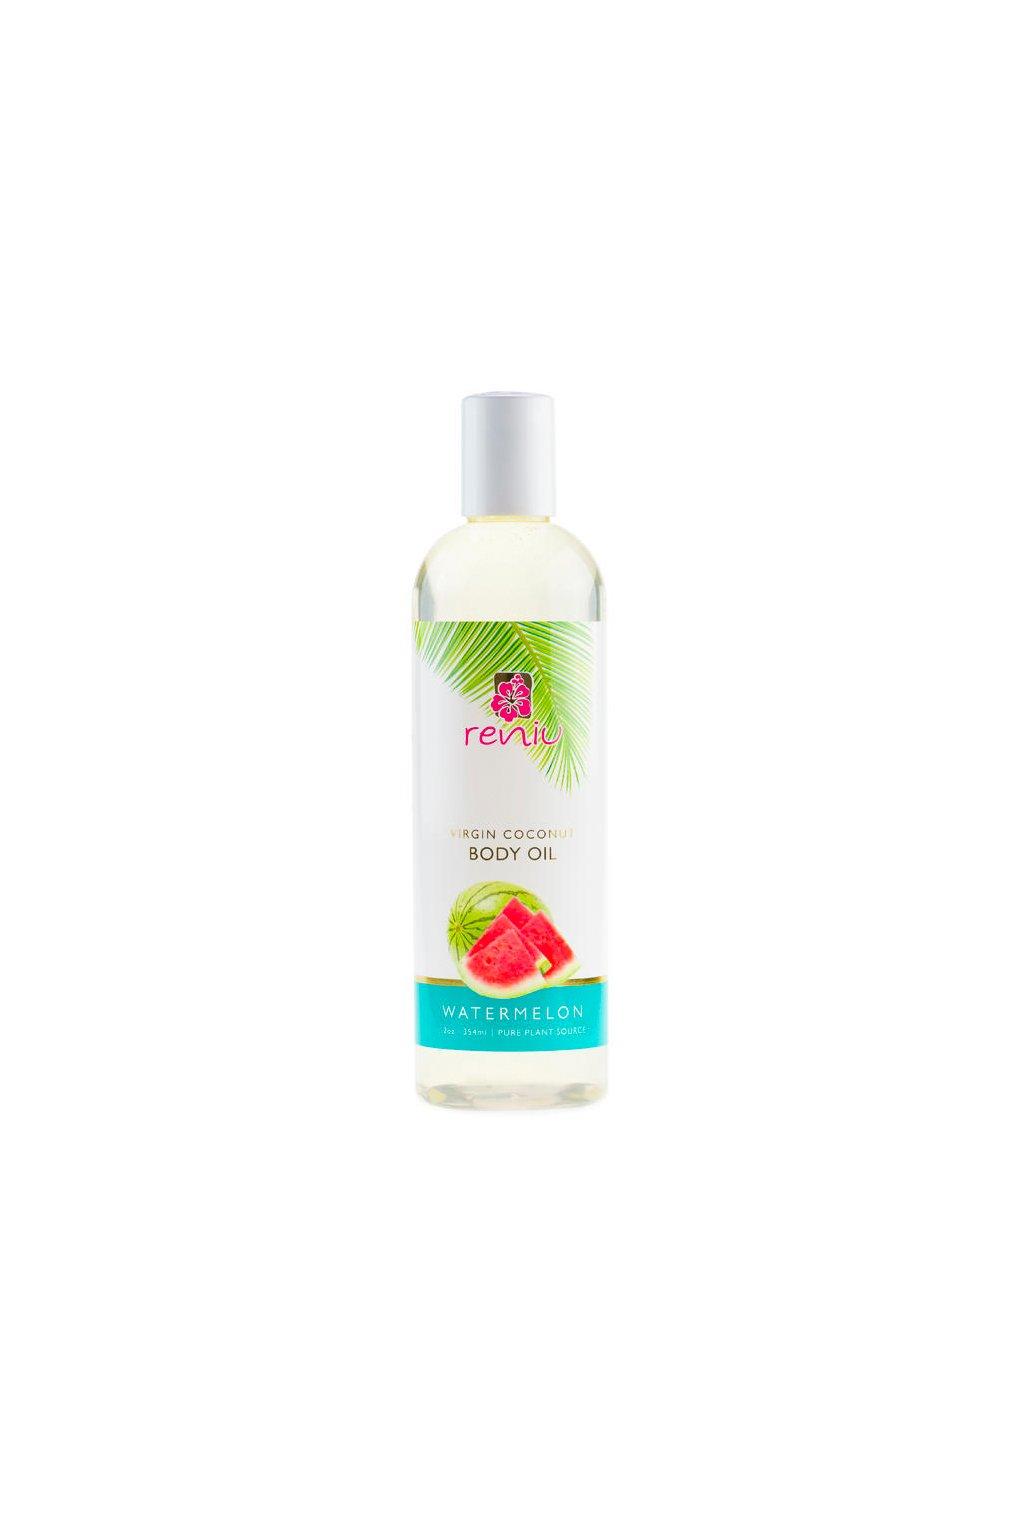 Reniu extra panenský olej 354ml vodni meloun